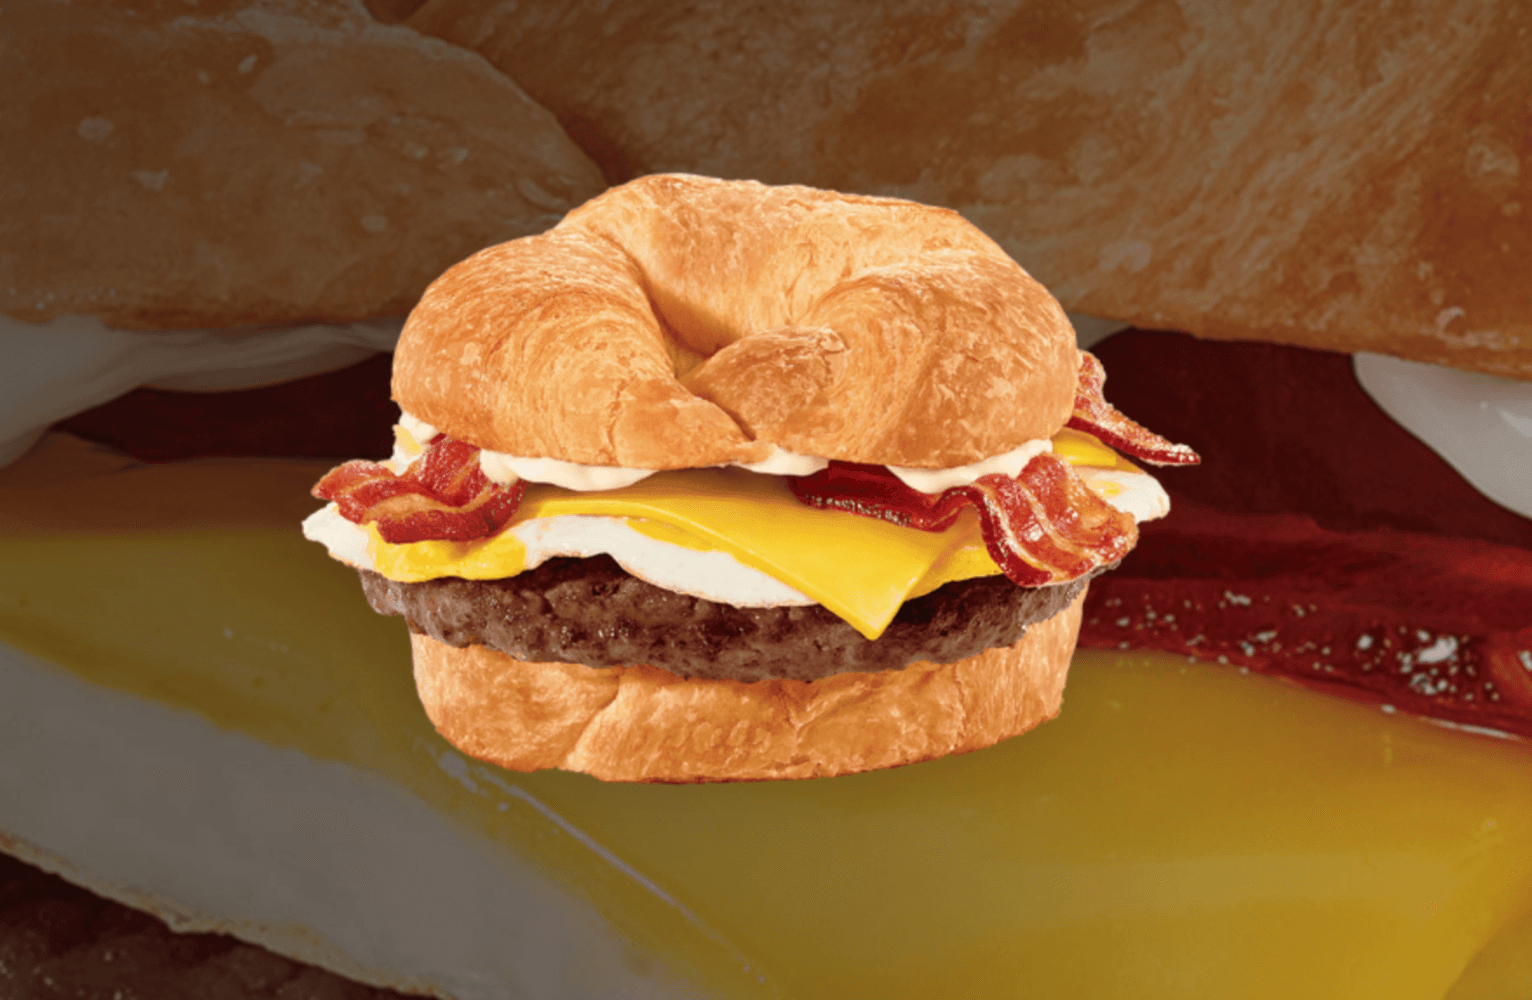 Jack in the box brunch burger